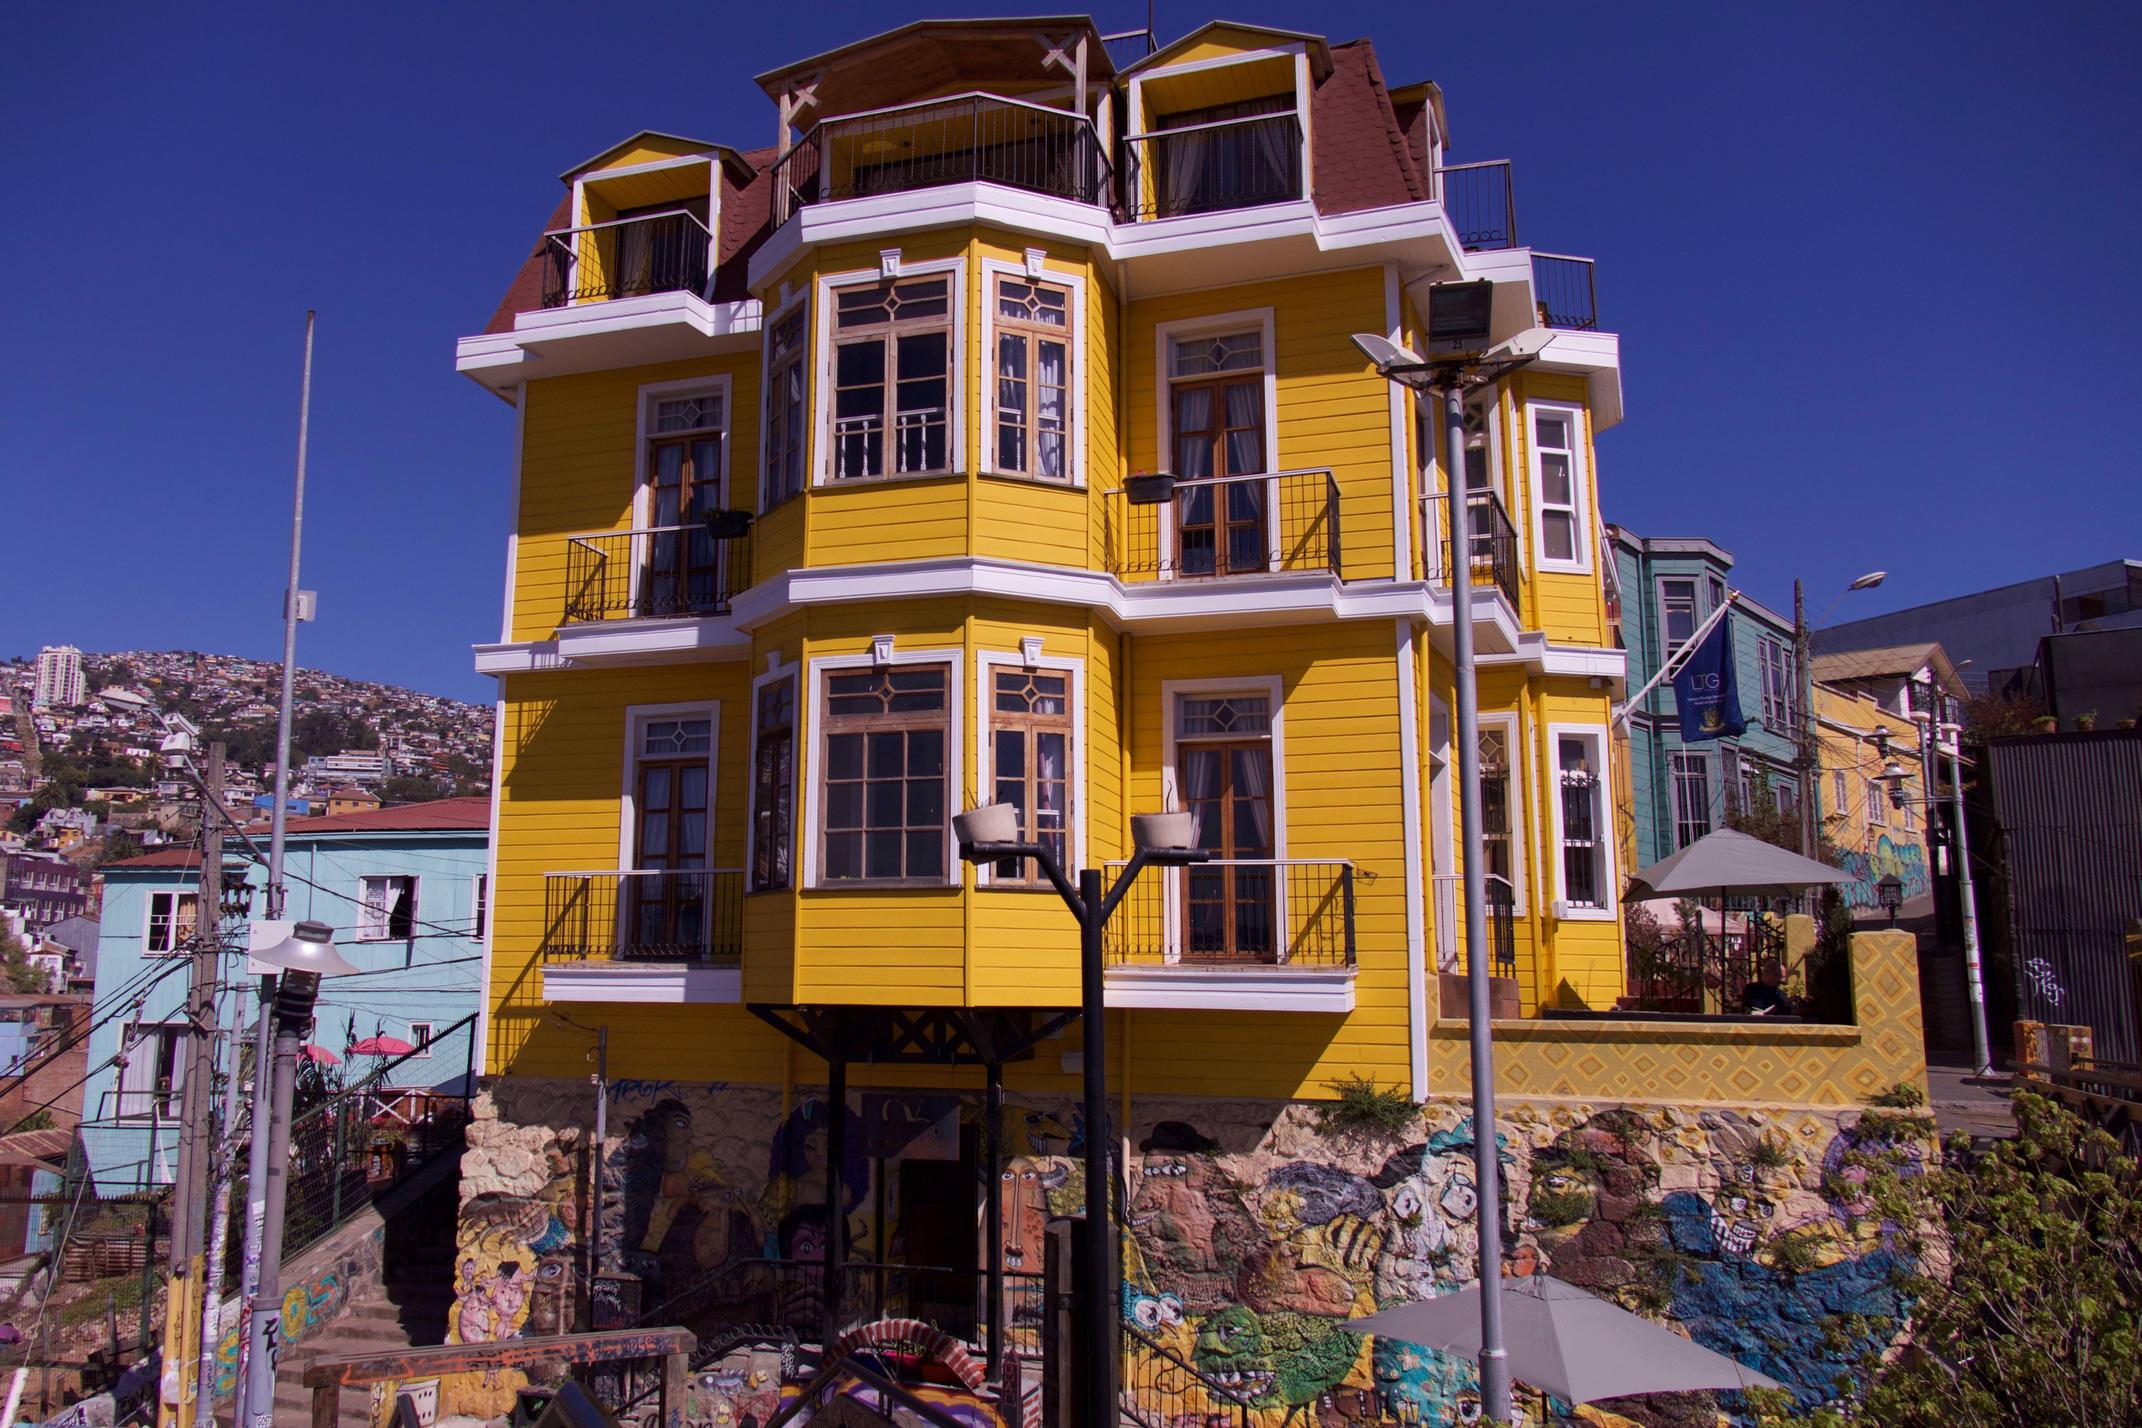 Chile central coast valparaiso yellow house